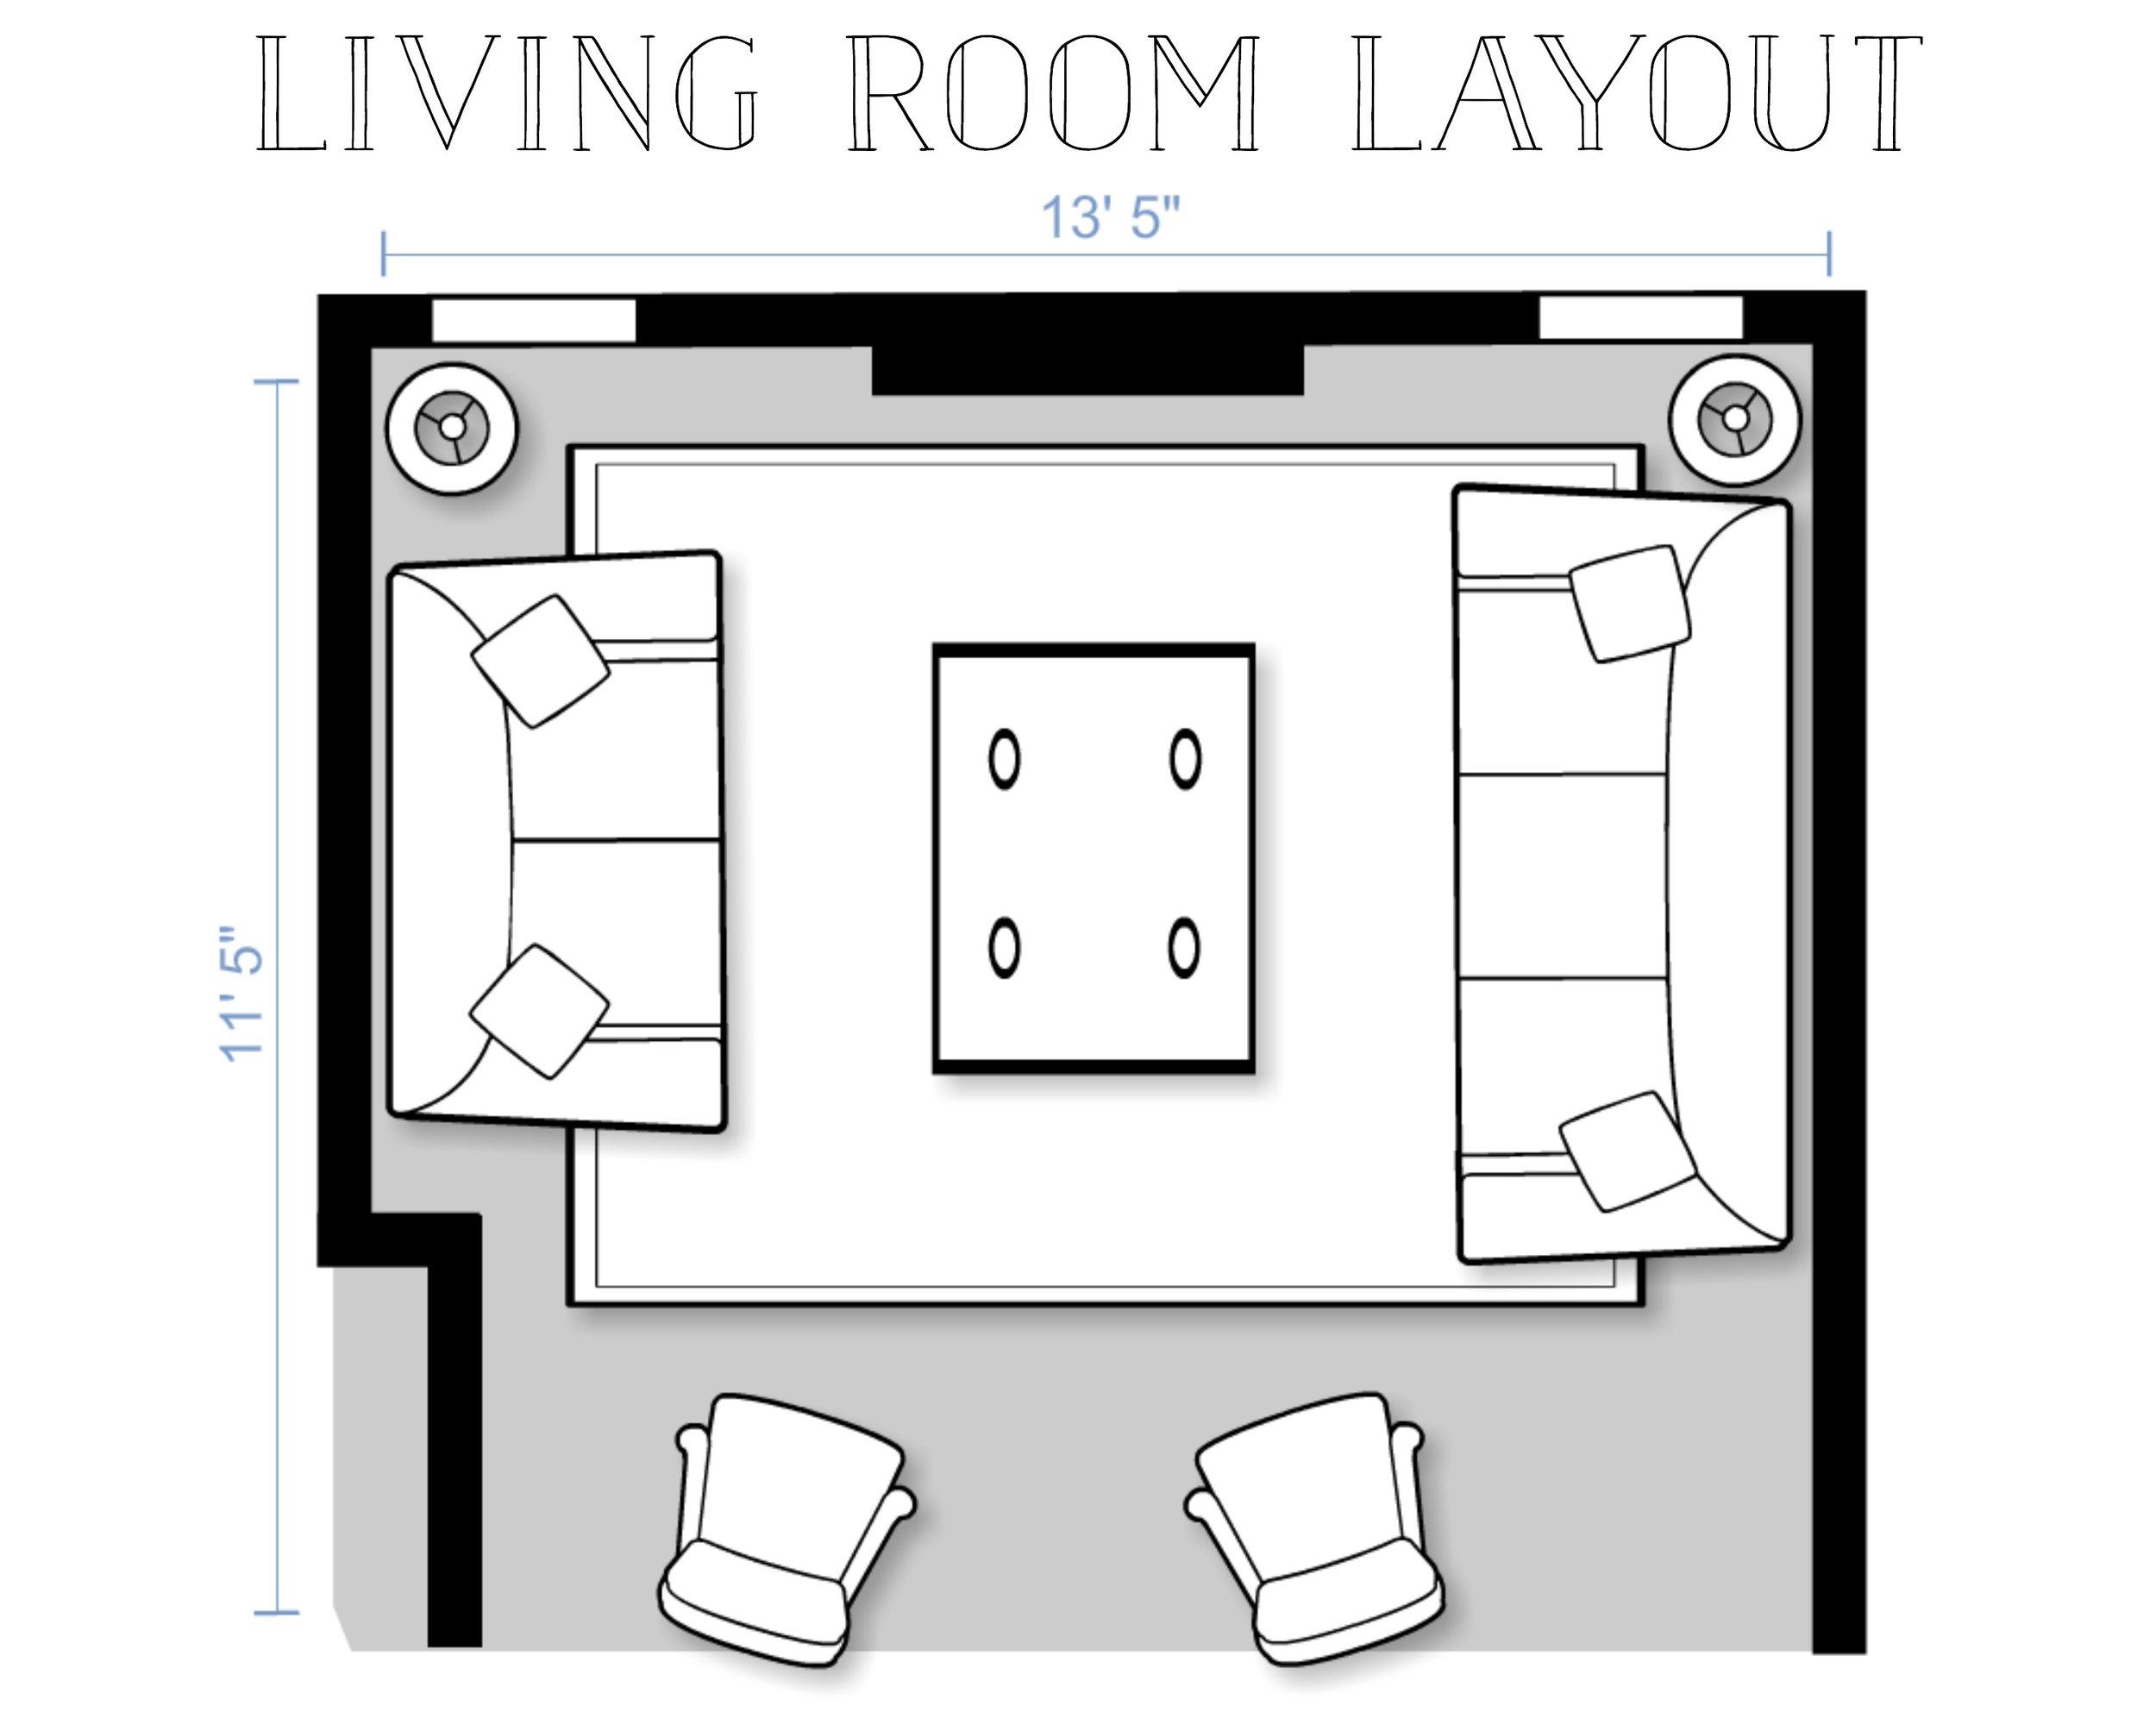 Living Room Layout Design